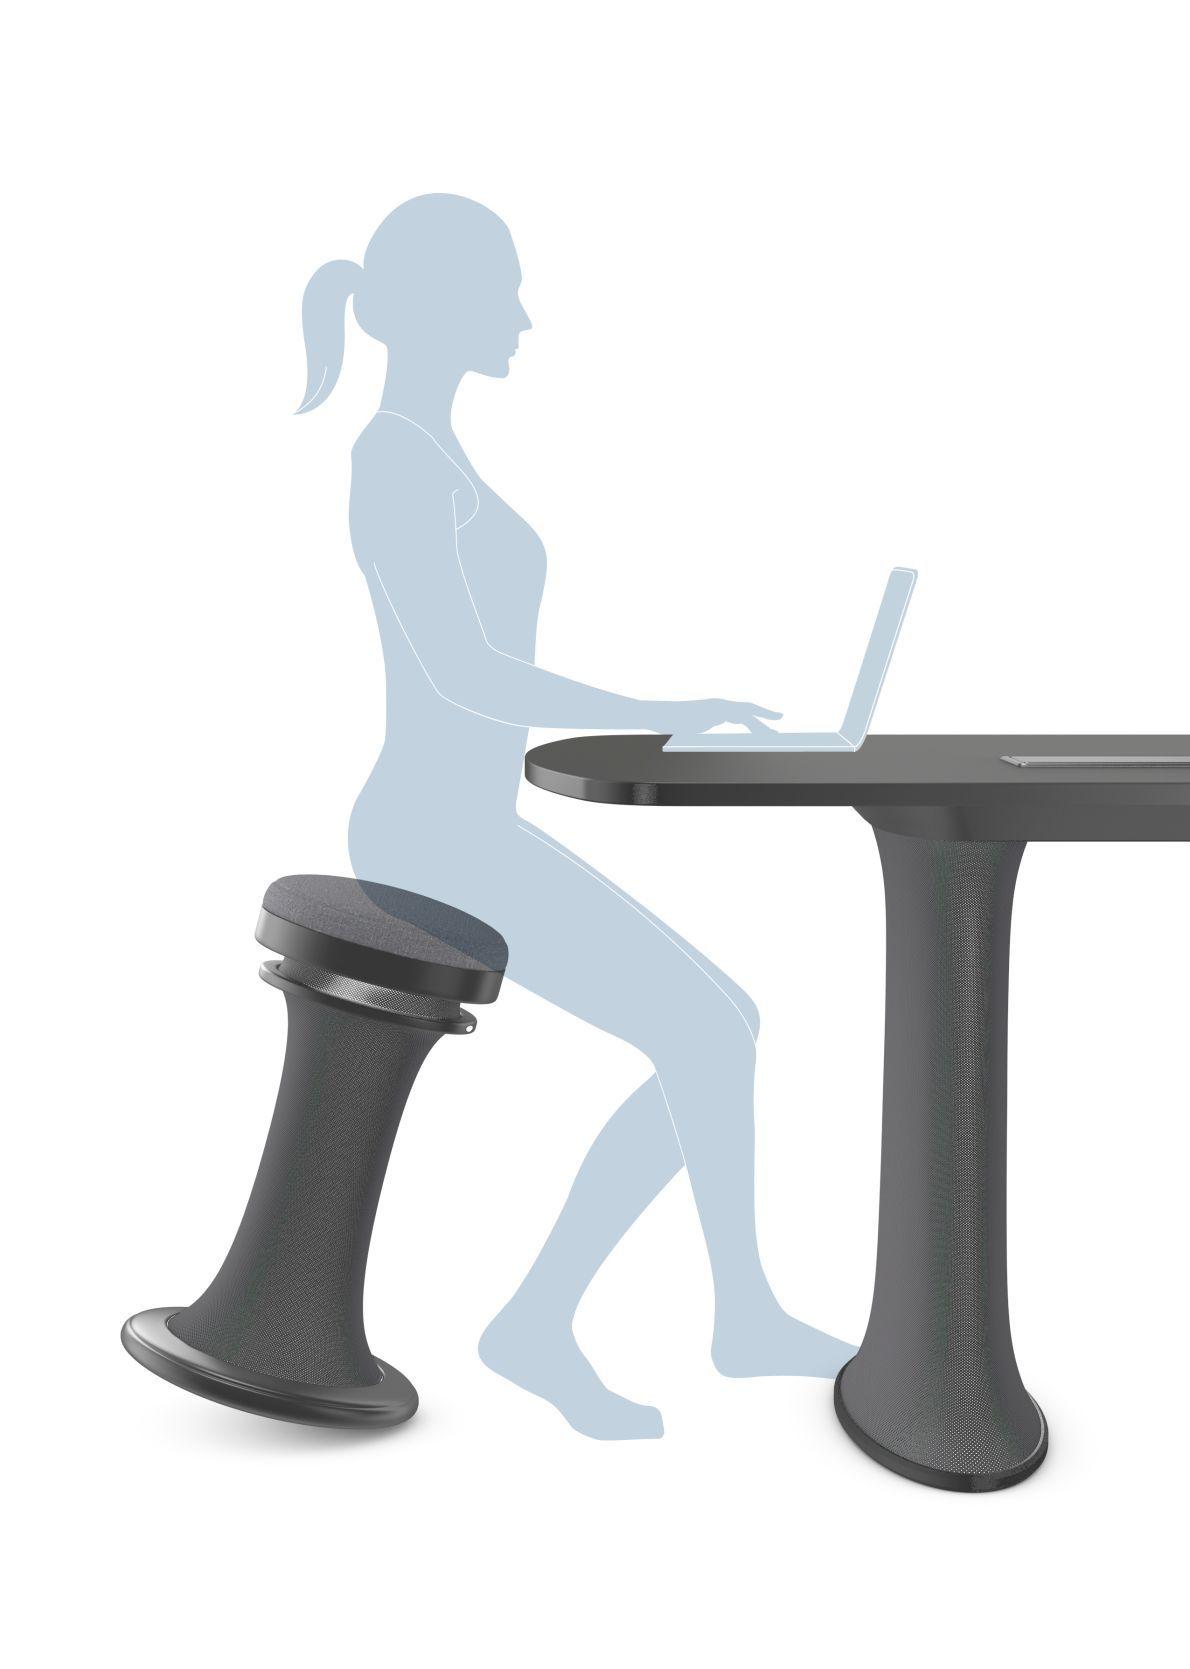 Brunner dress desk with standing aid http://www.brunner-group.com/en ...